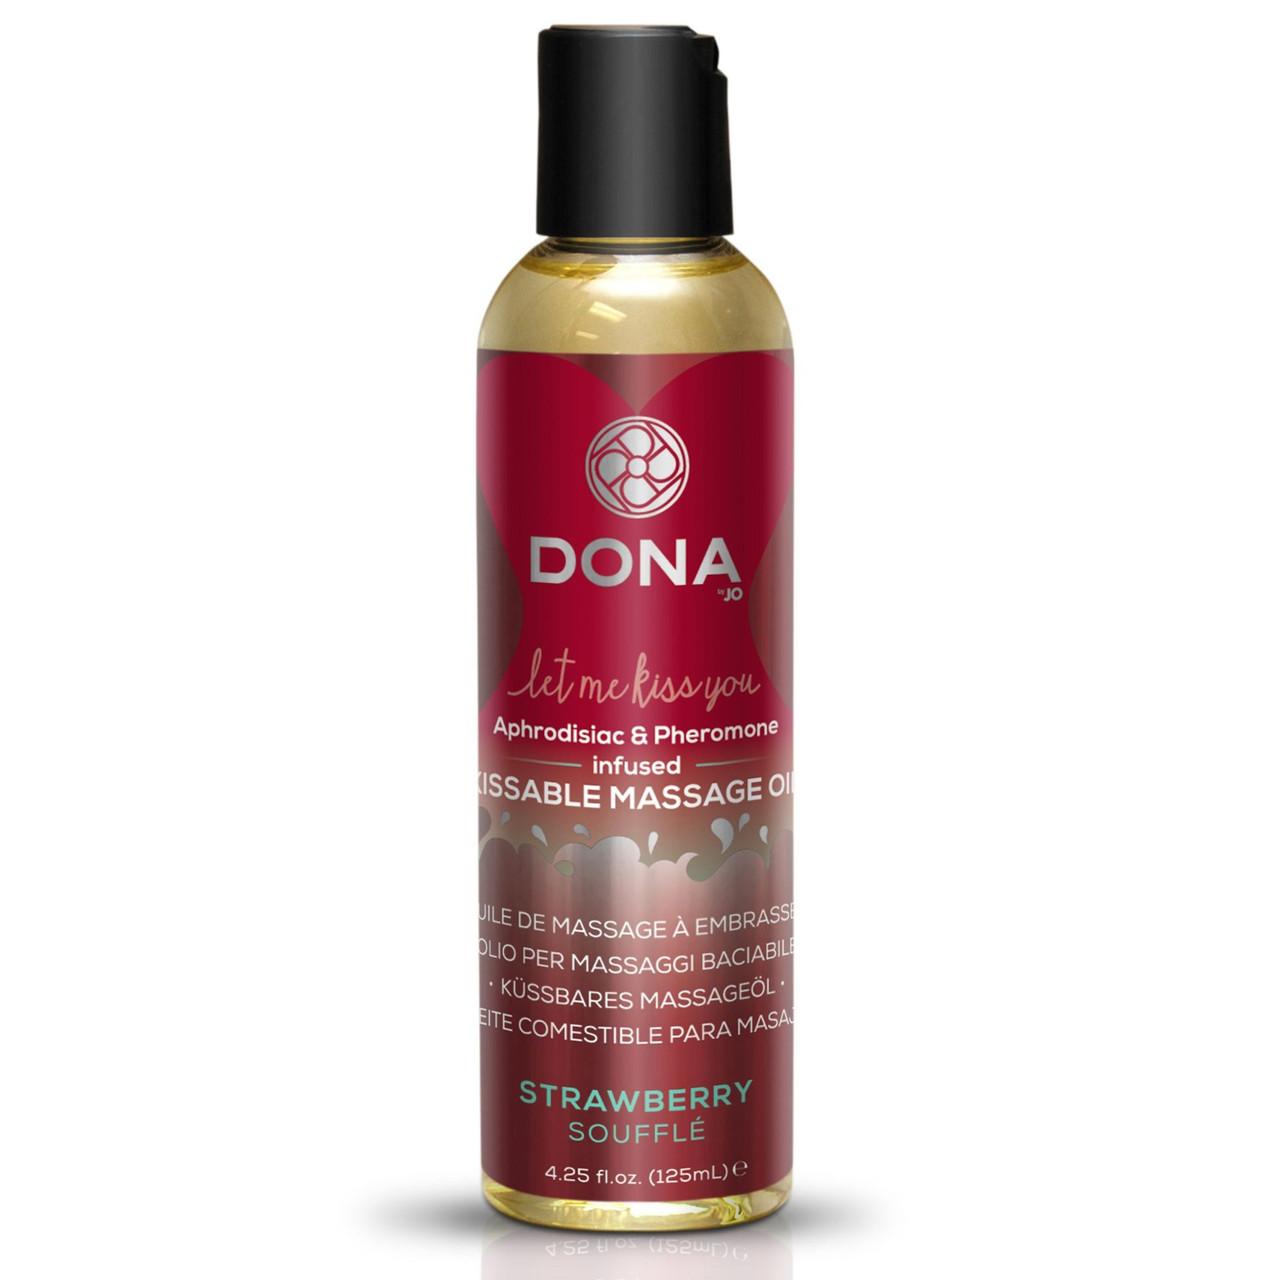 Массажное масло DONA infused  со вкусом Strawberry Souffle, 110 мл